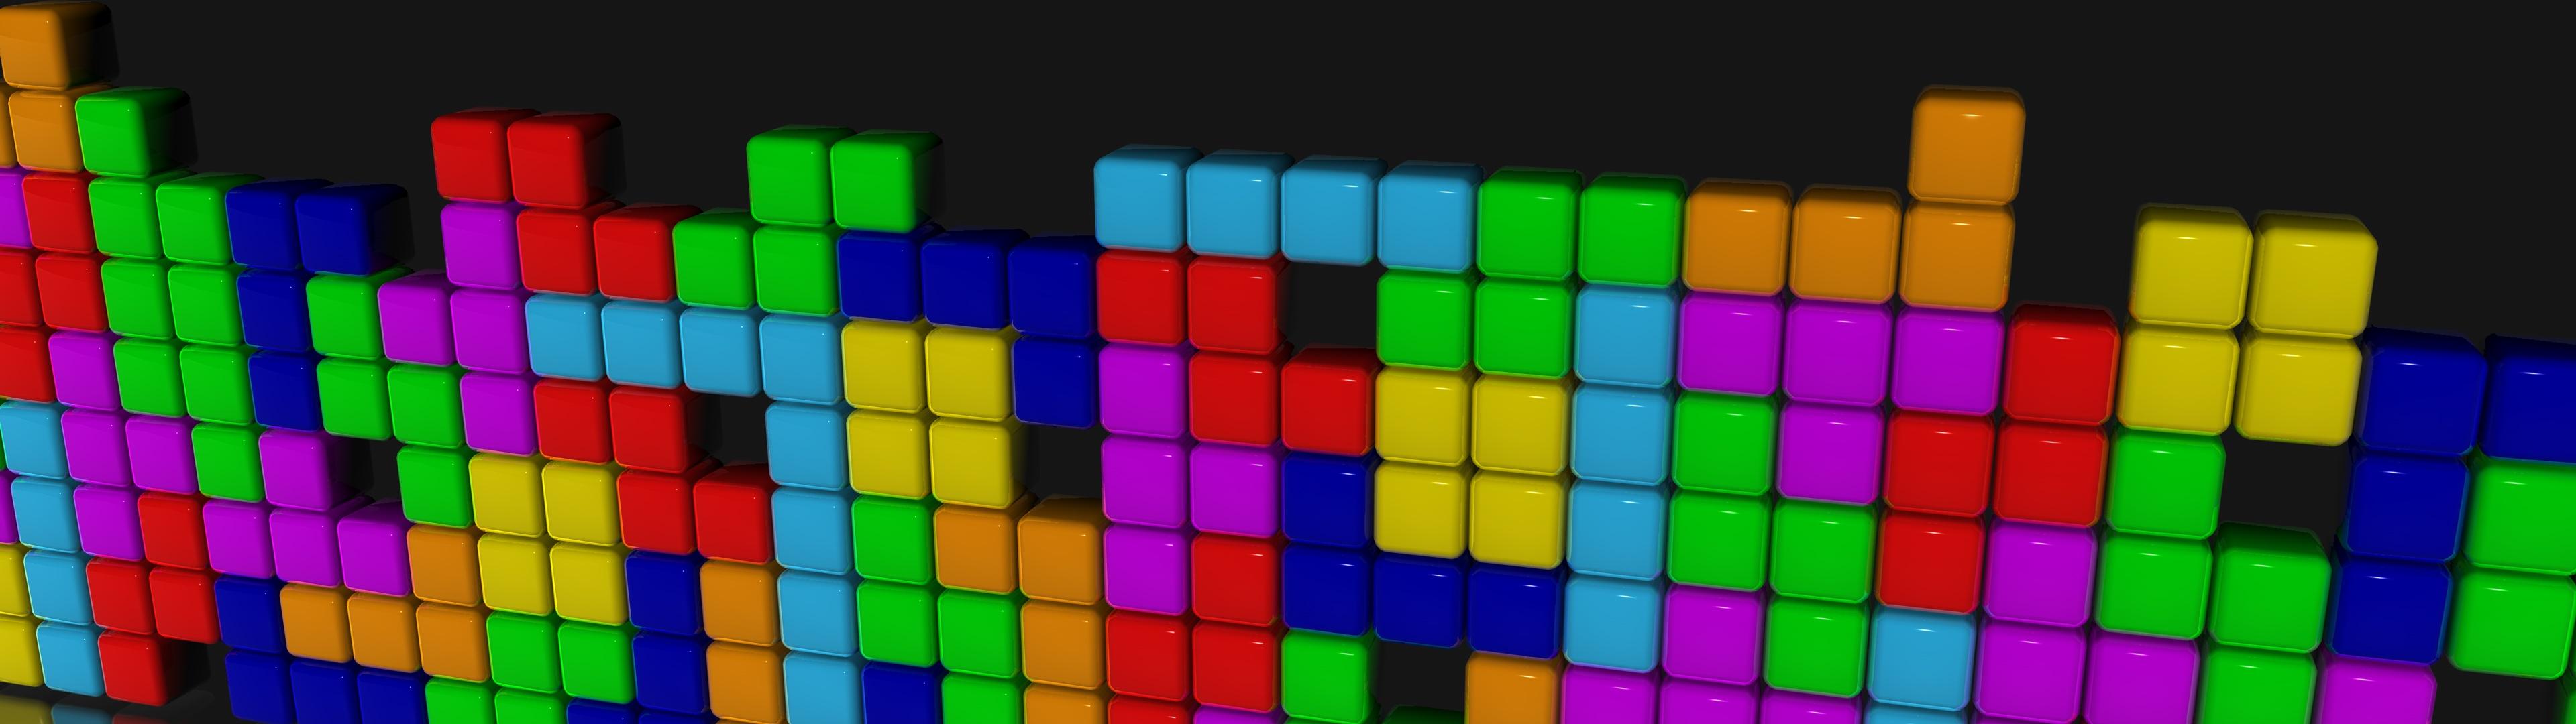 tetris computer wallpapers desktop backgrounds